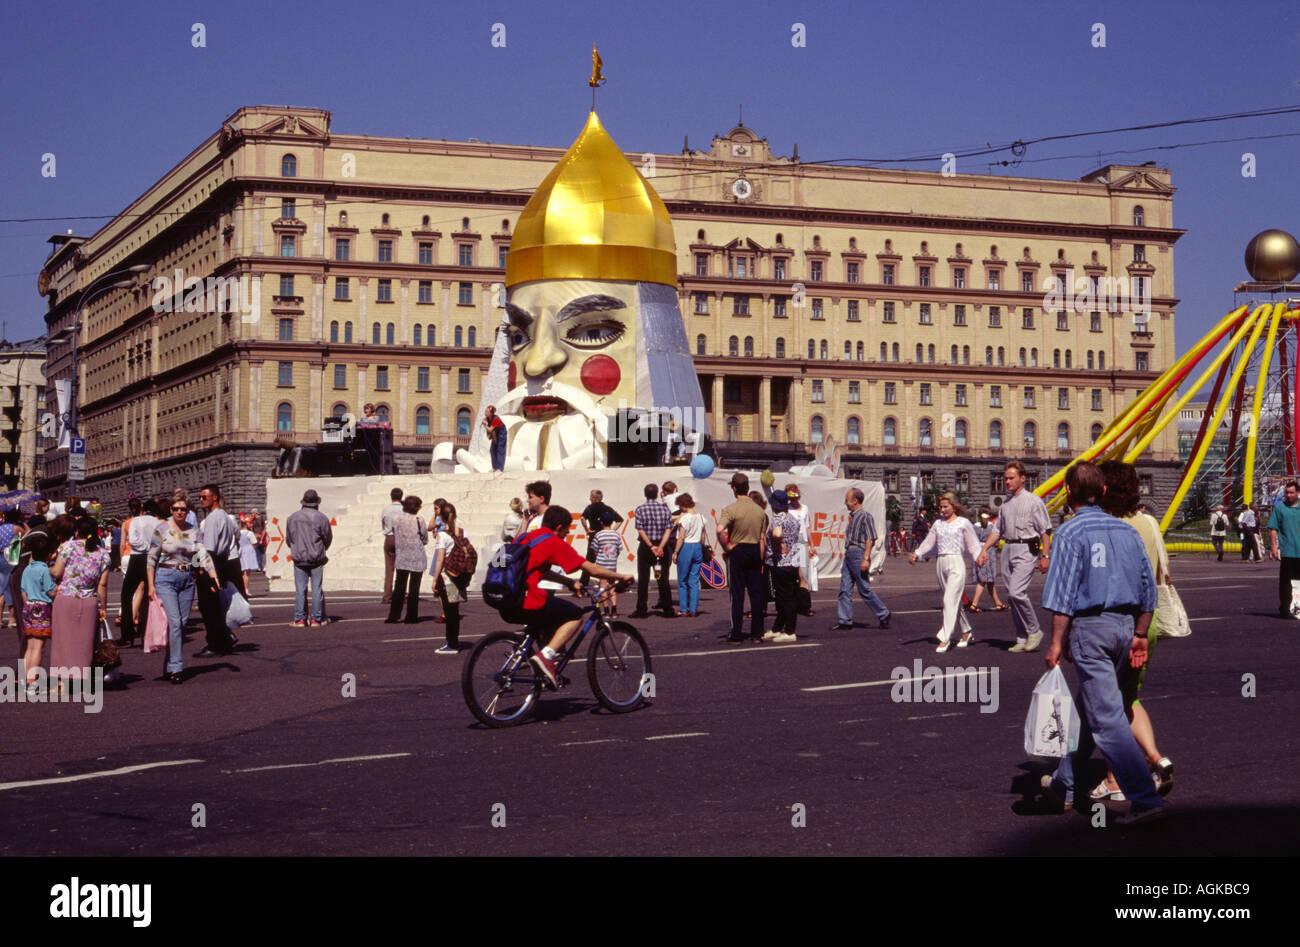 The FSB former KGB headquarters on Dzerzhinskaya Square Moscow Russia - Stock Image